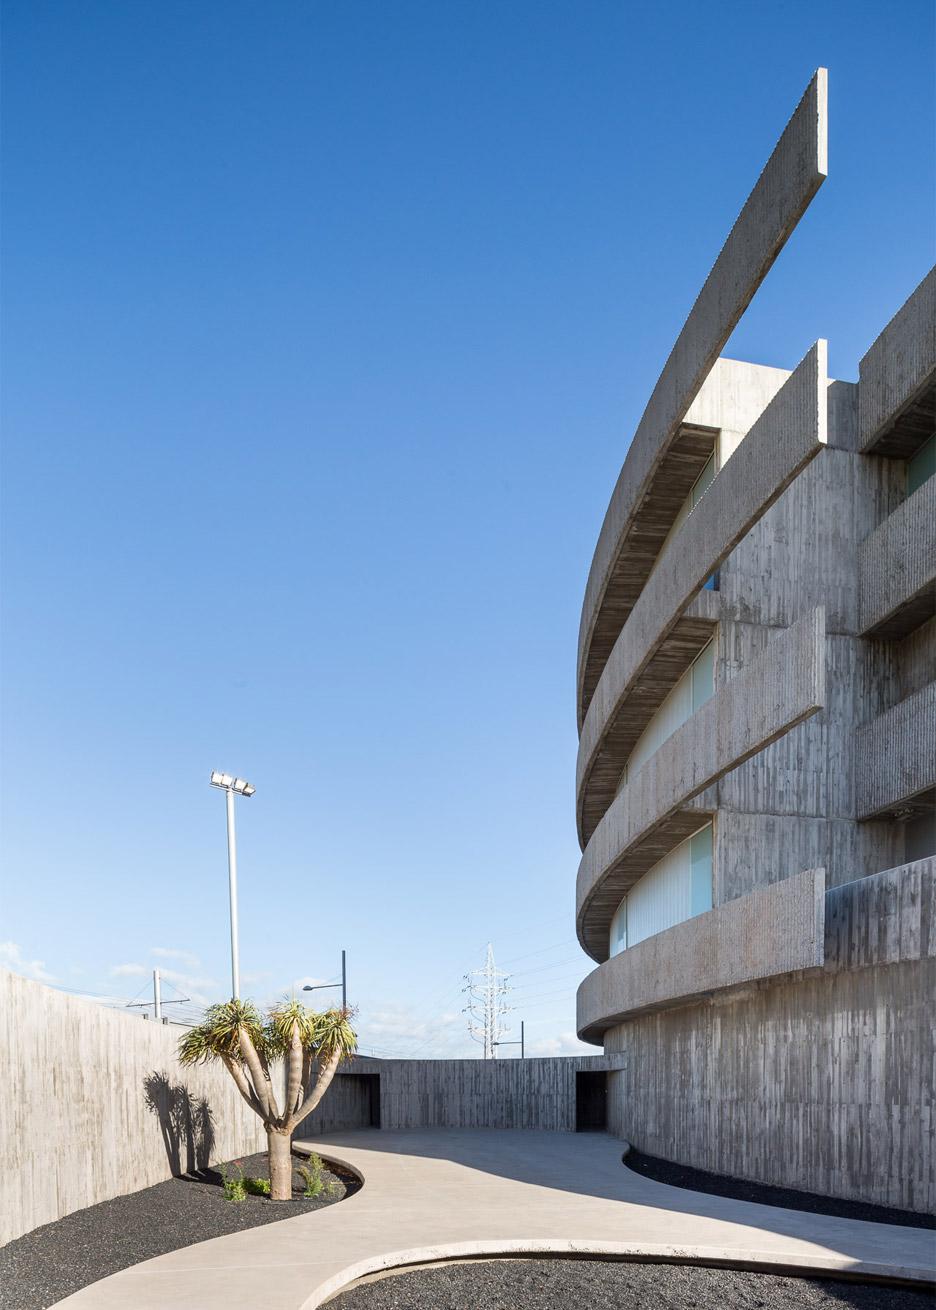 Faculty of Fine Arts, University of La Laguna by GPY Arquitectos